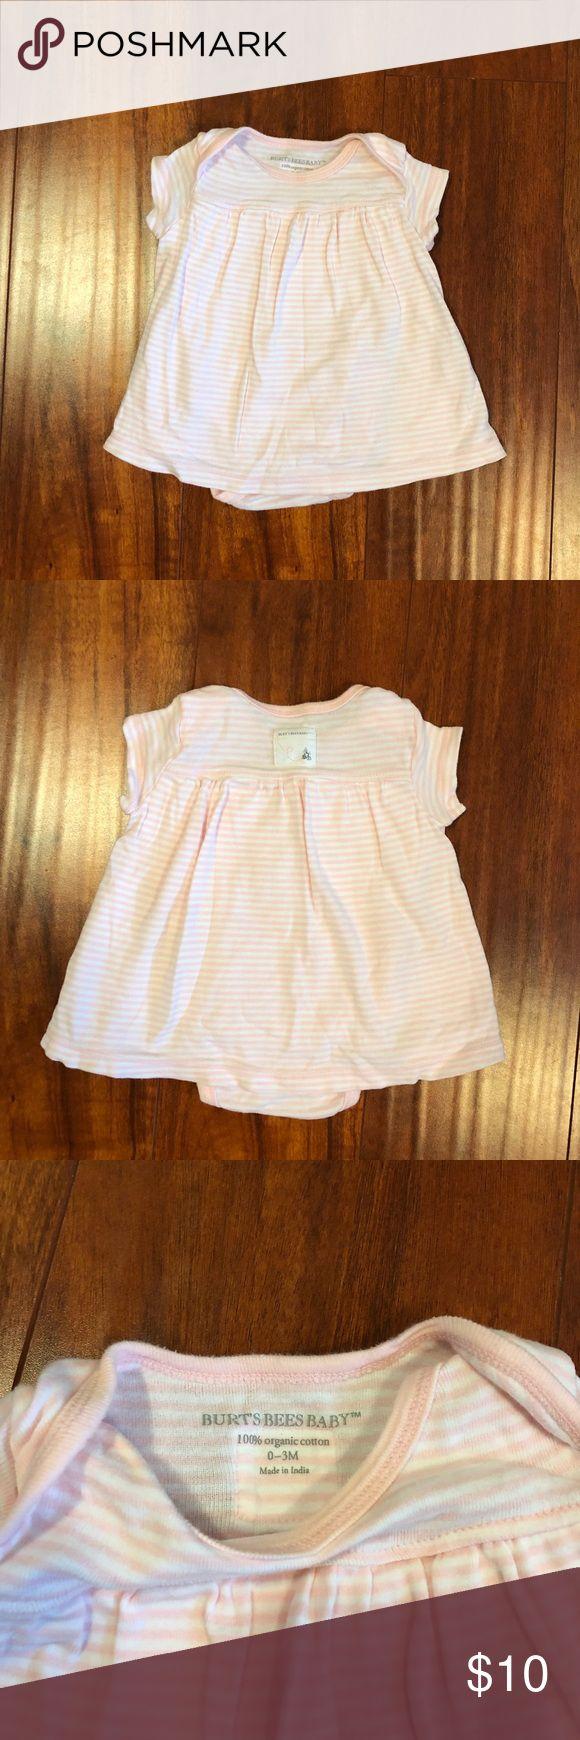 Burt's Bees Baby 0-3mo dress 100% Organic Cotton Burt's Bees Baby girl dress. 0-3mo So soft and cute. Gently worn. From pet free & smoke free home. Burt's Bees Baby Dresses Casual